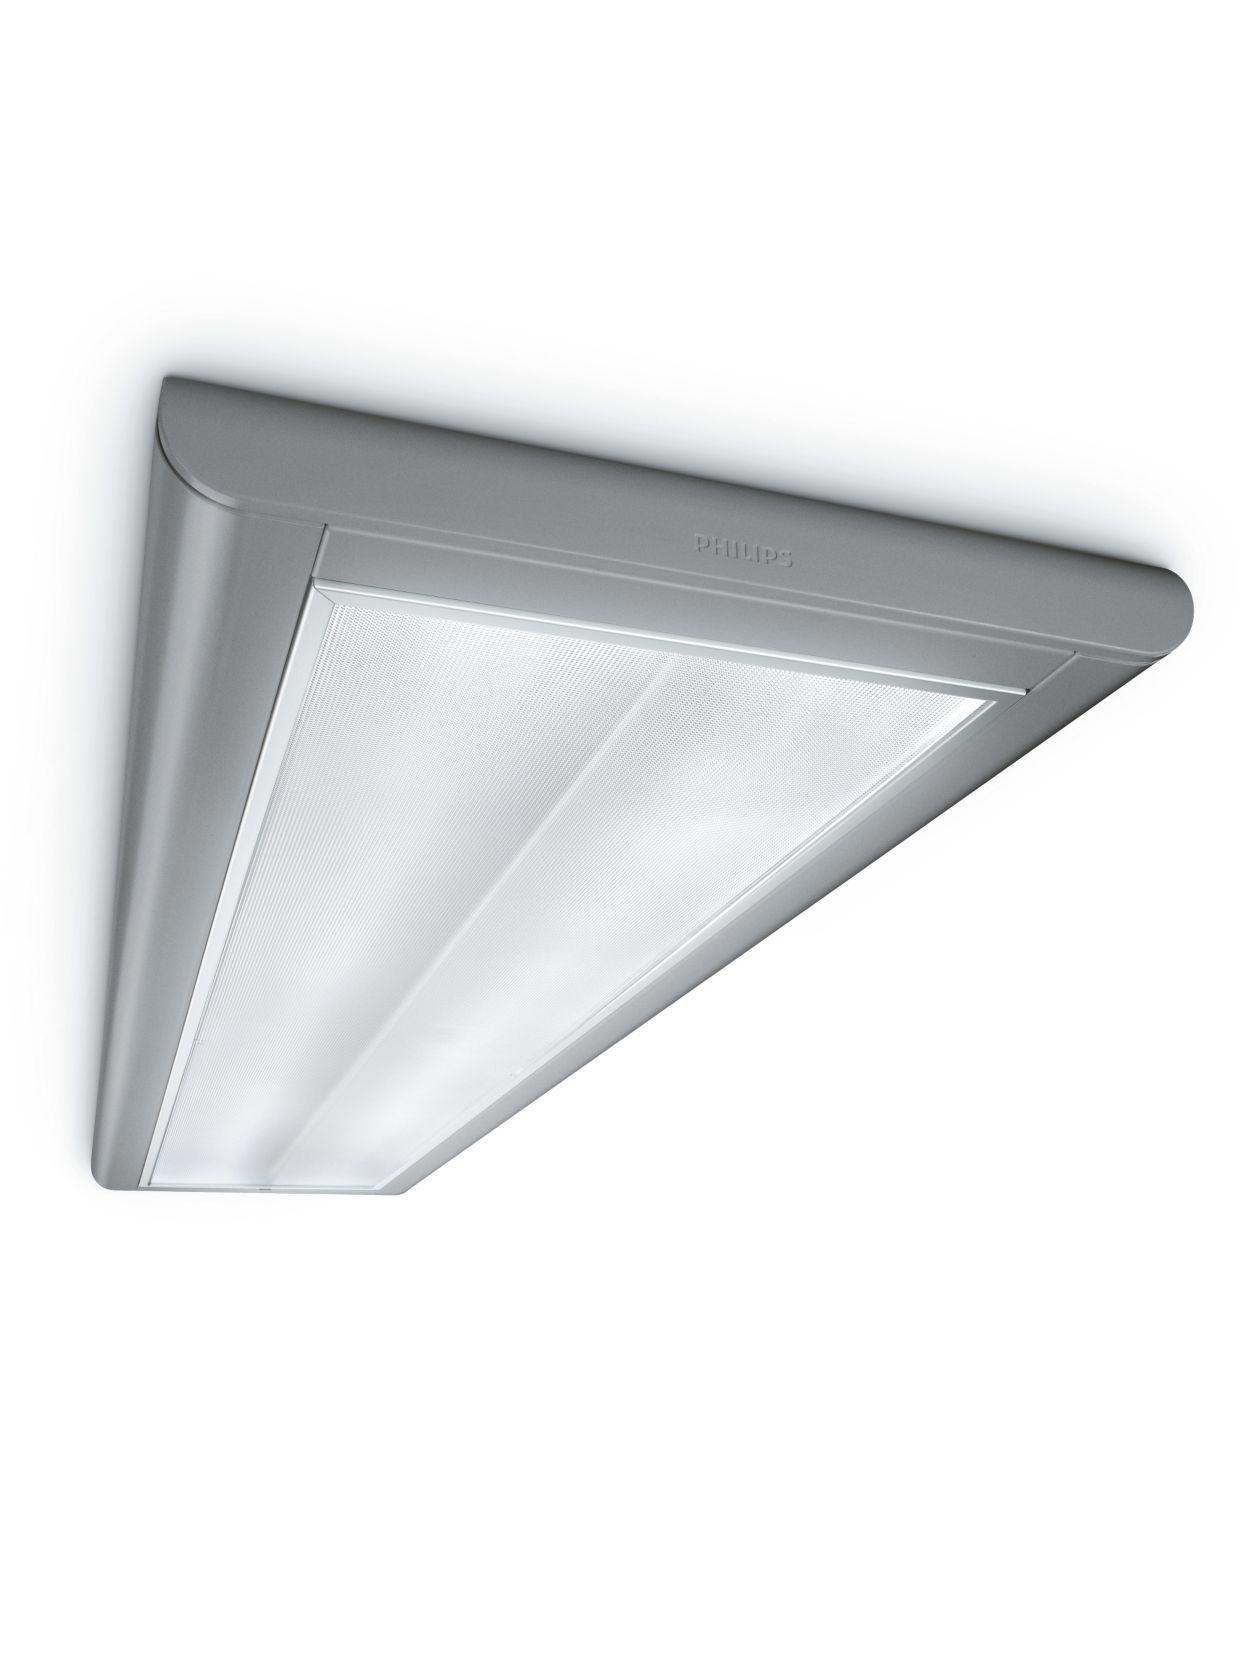 SmartForm LED BCS460 Surface mounted - Philips Lighting